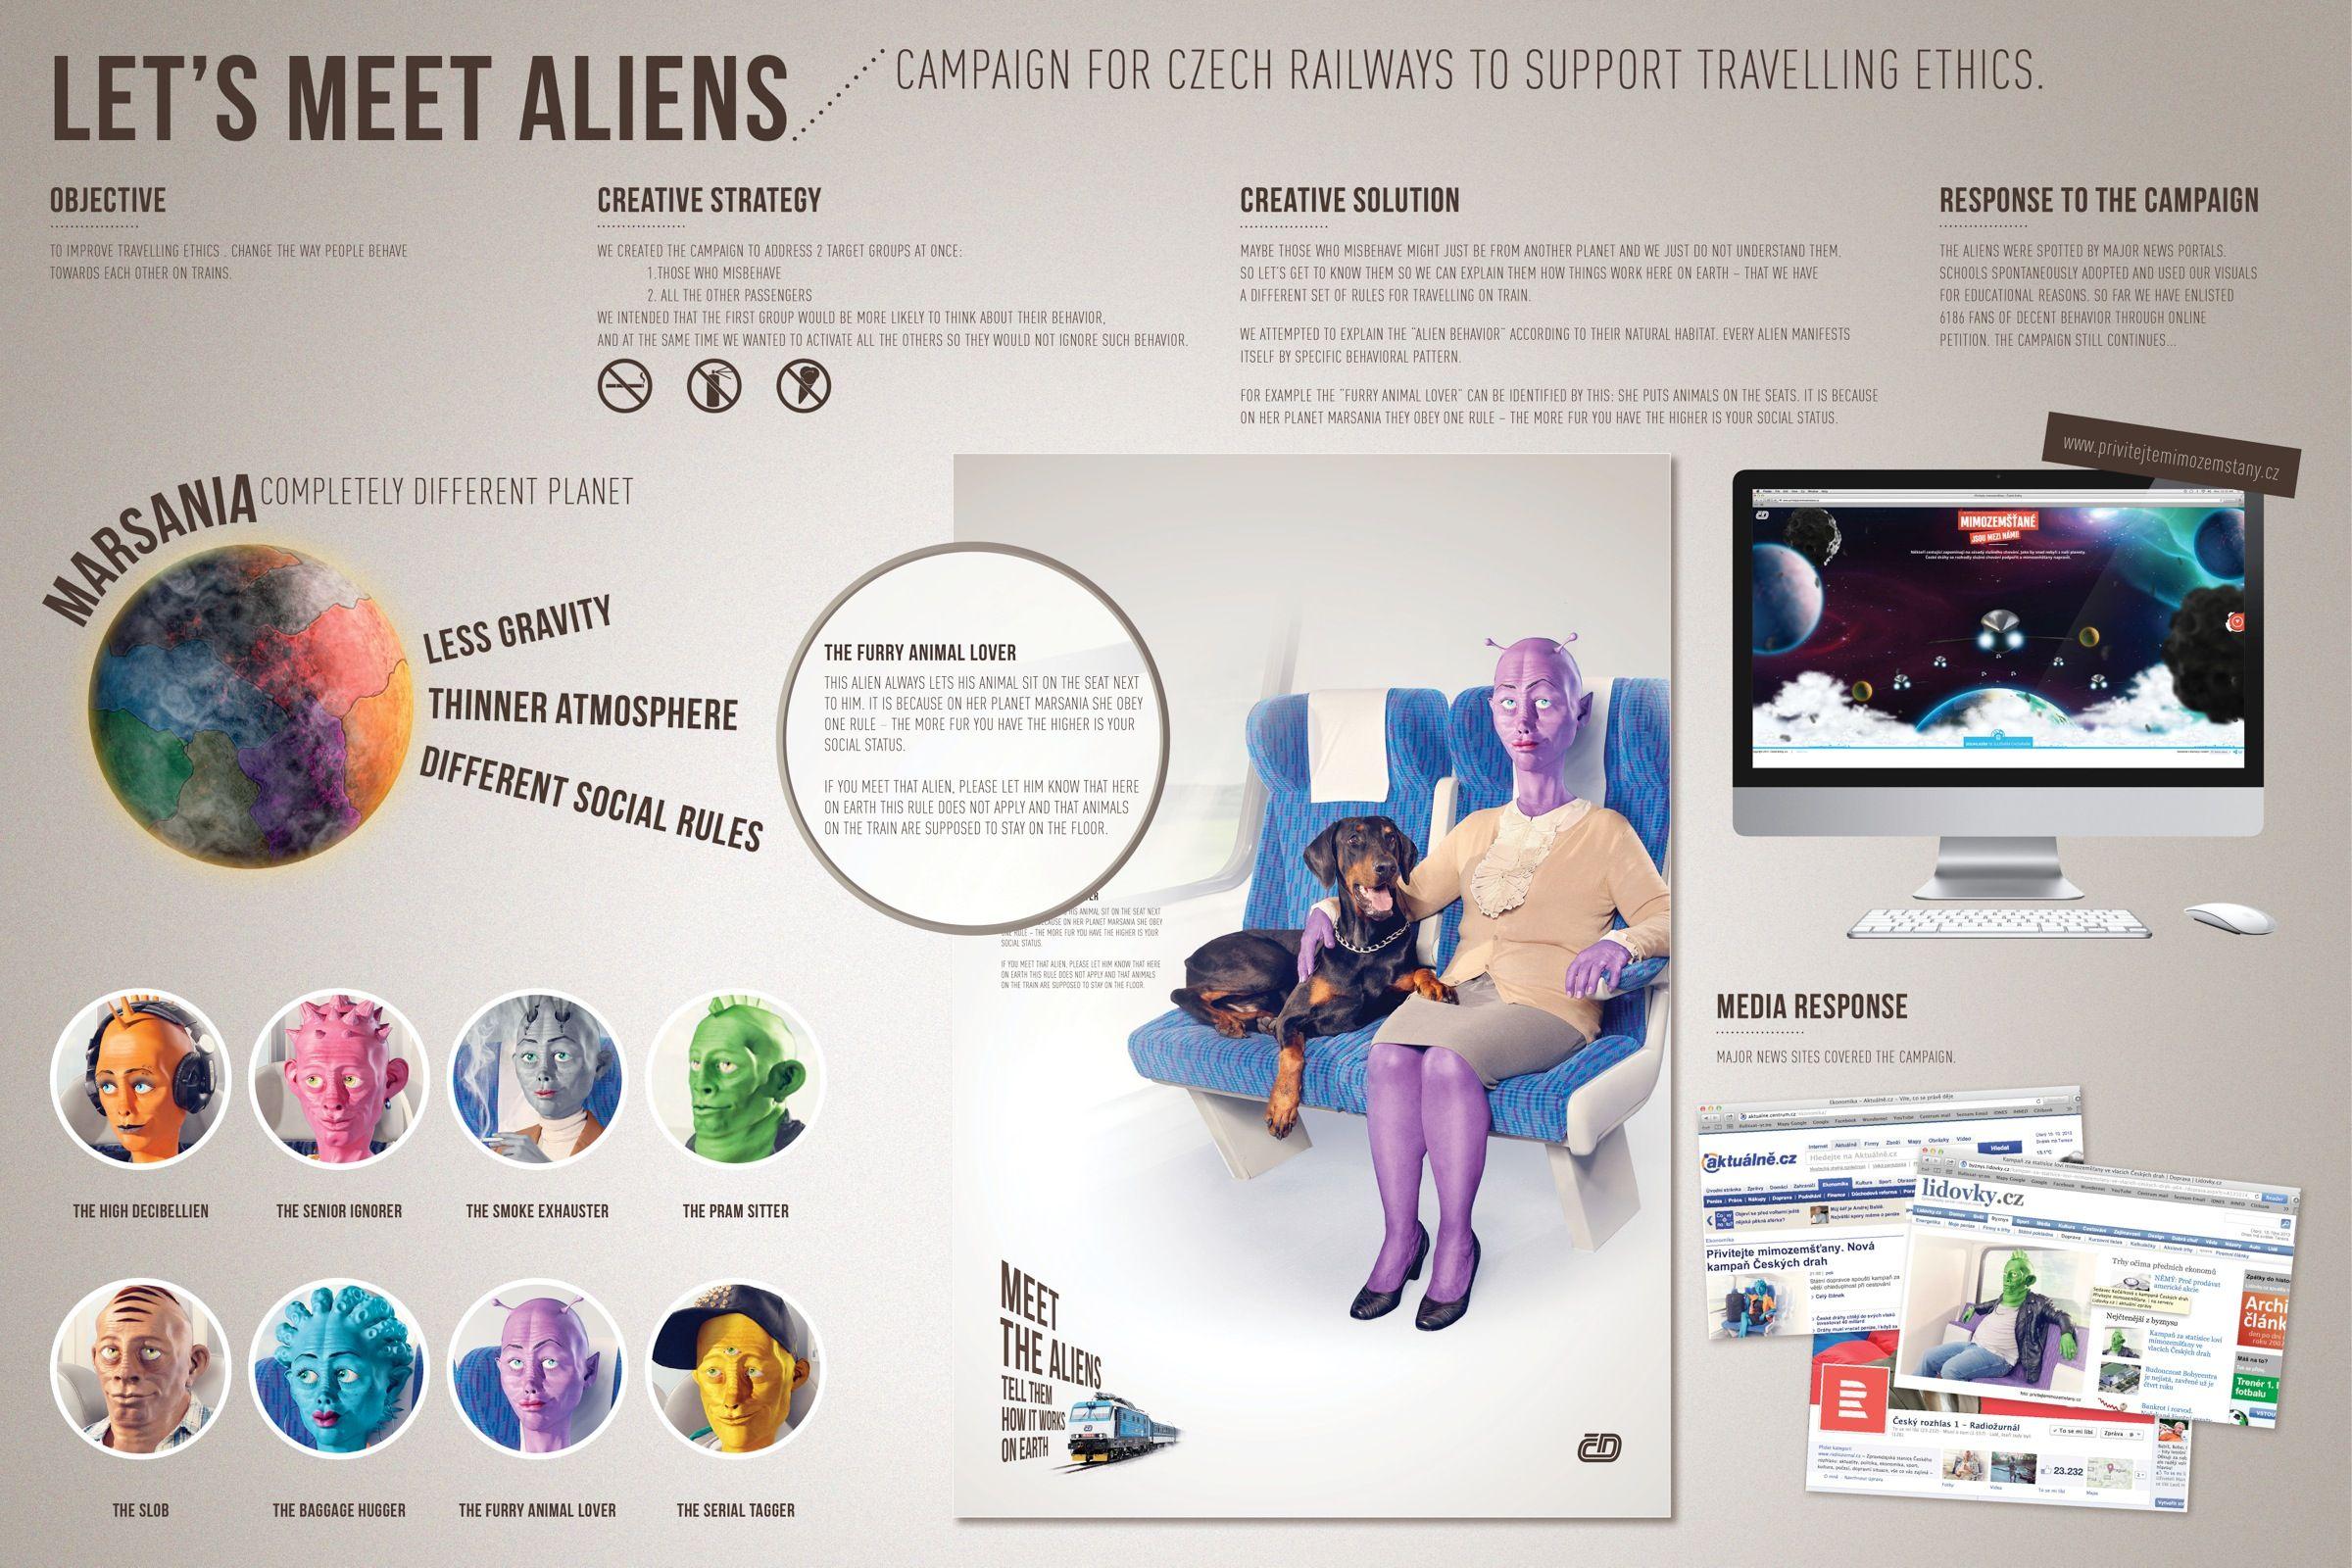 Czech Railways: Aliens